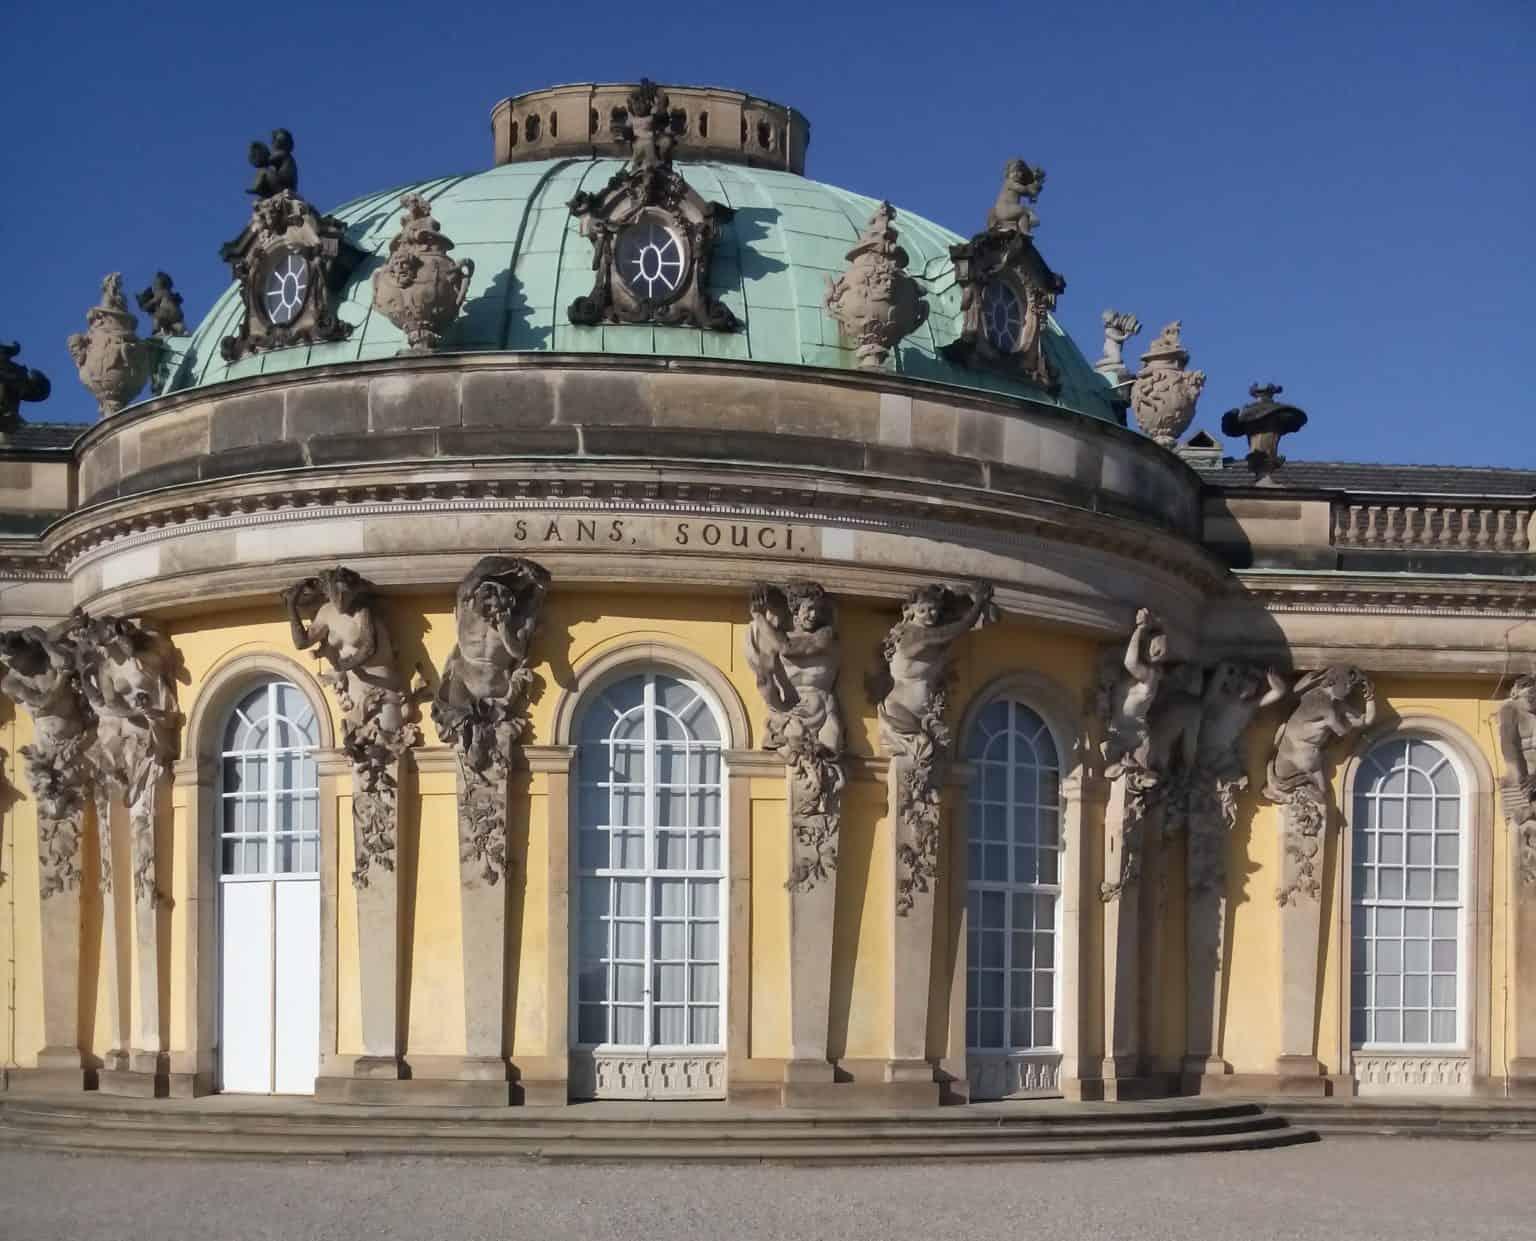 The Best of Potsdam Walking Tour